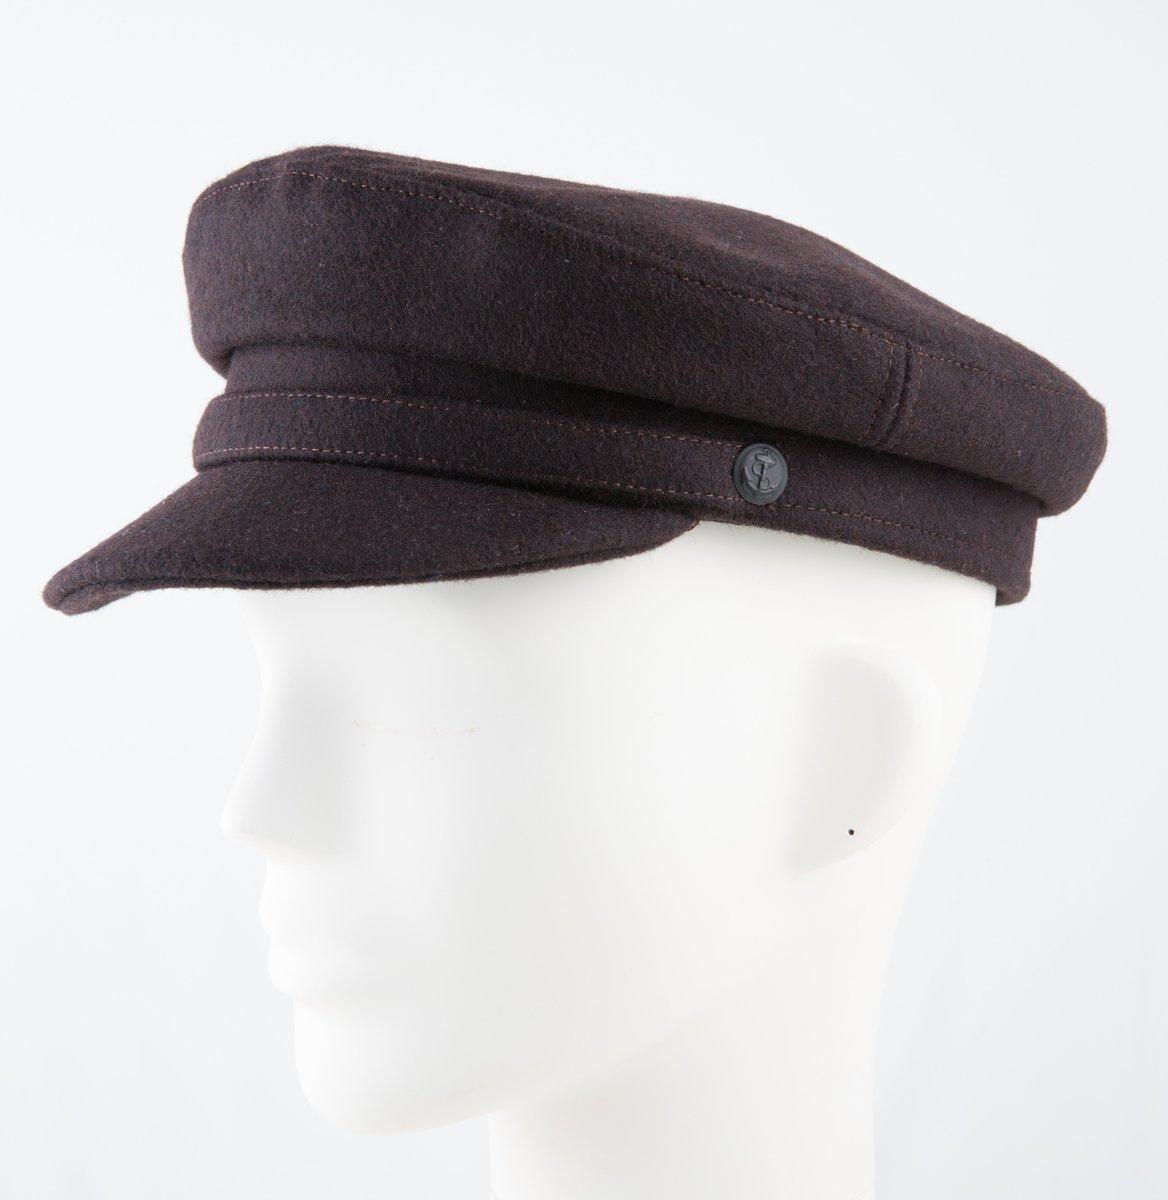 Toukitsou Co ·  Toukitsou1. Luxury Greek Fisherman s Hats   Caps ... 8a85614e035